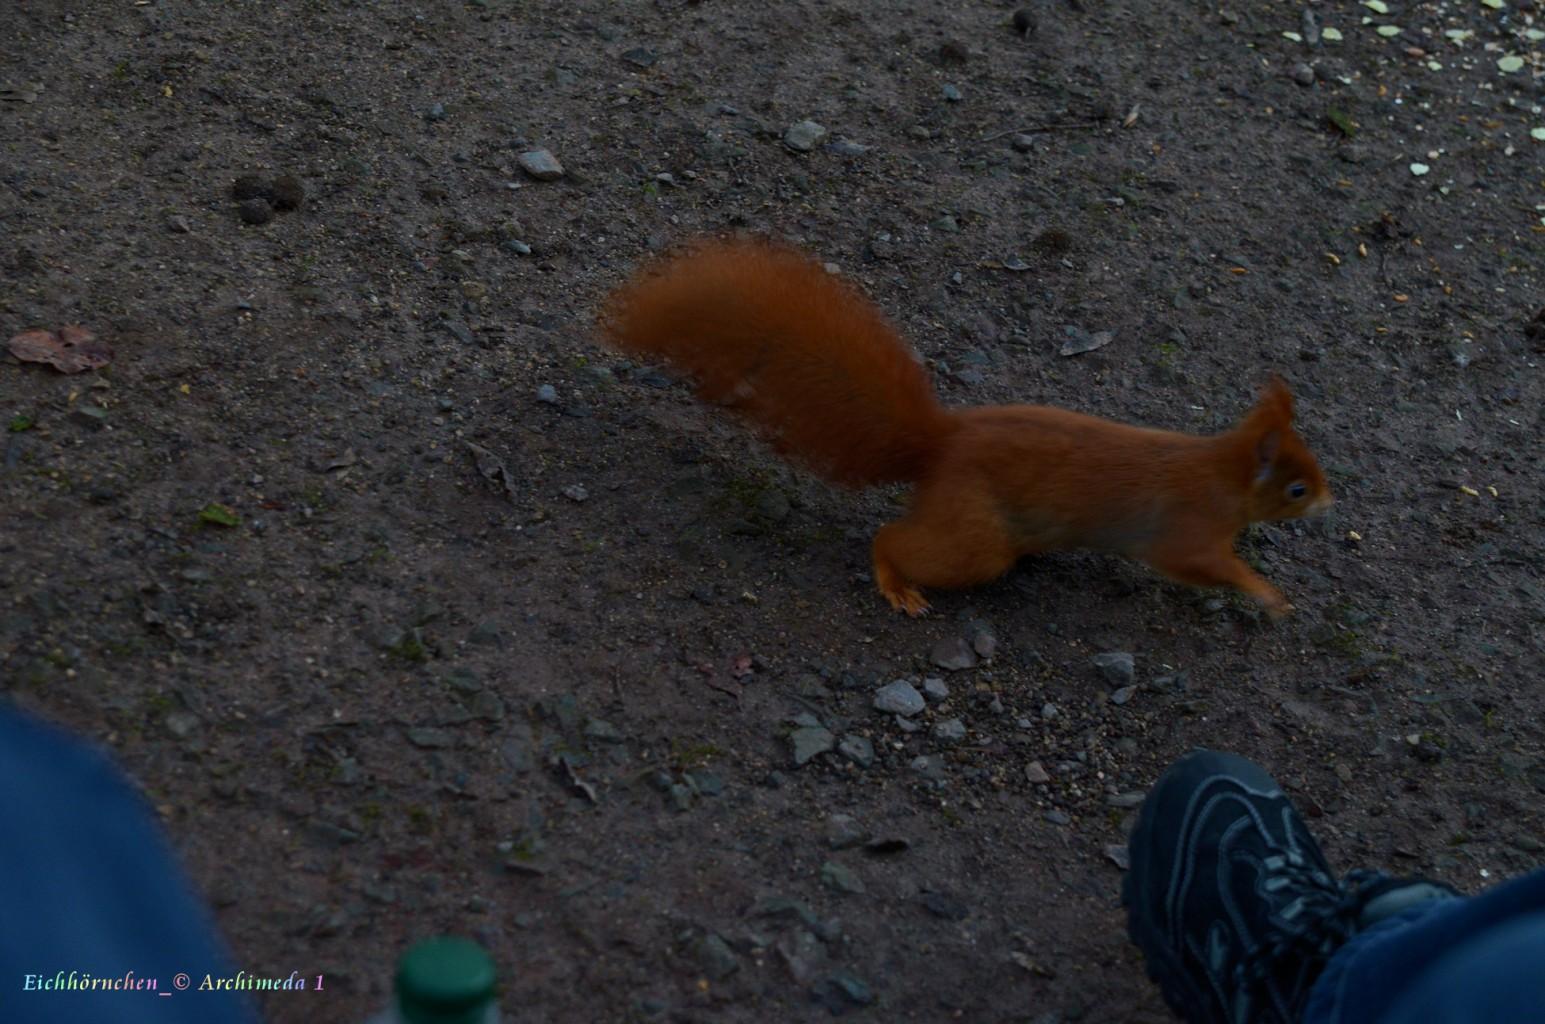 Eichhörnchen_© Archimeda 1_2